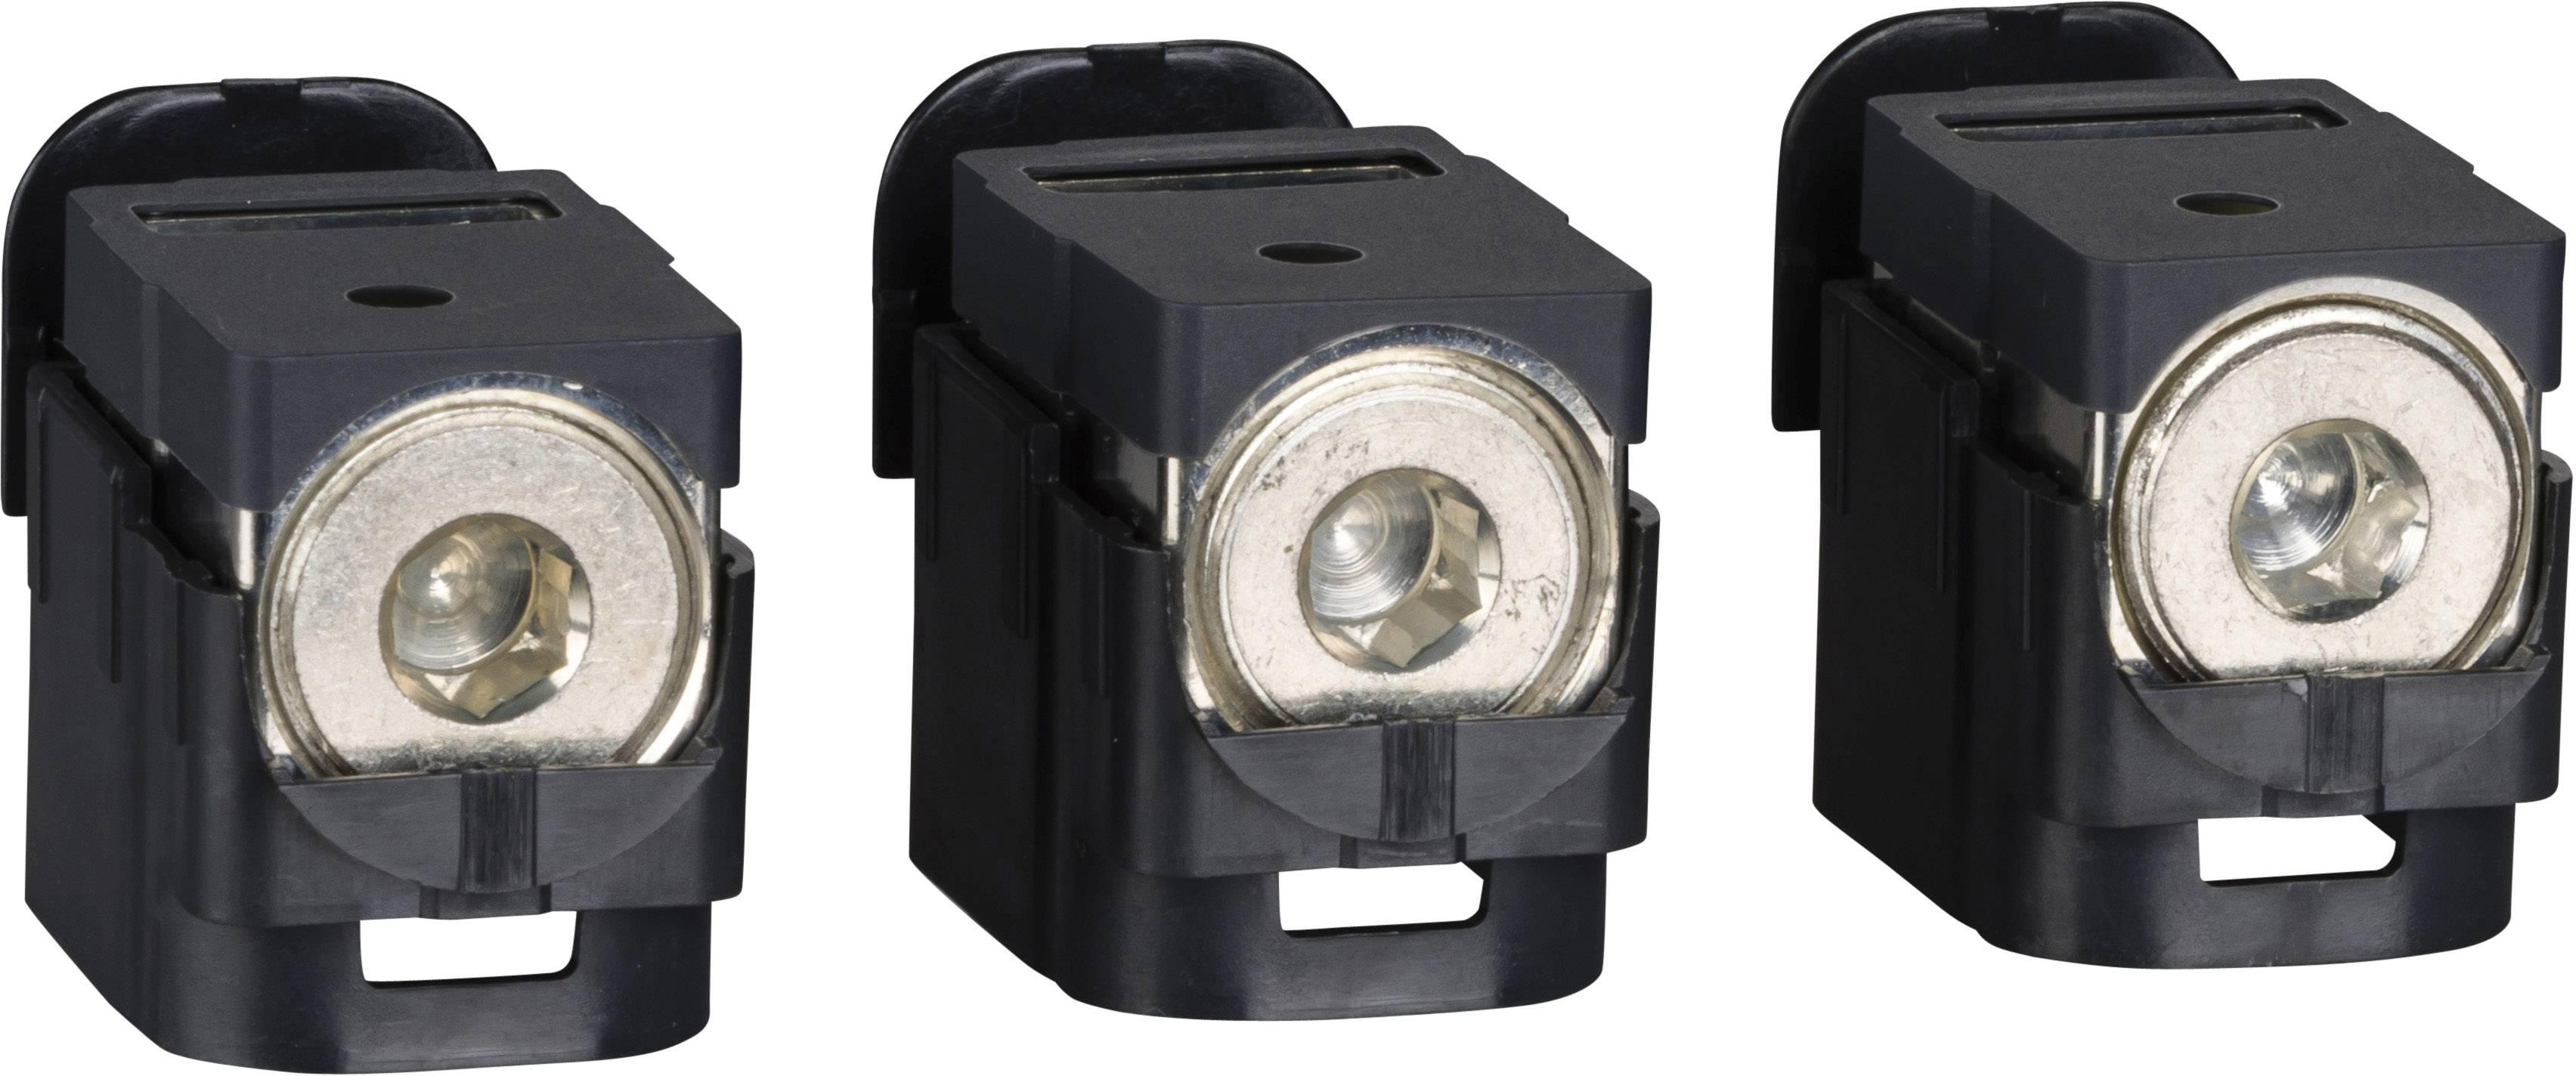 Rámová svorka Schneider Electric LV429227 LV429227, 250 A, 1 ks